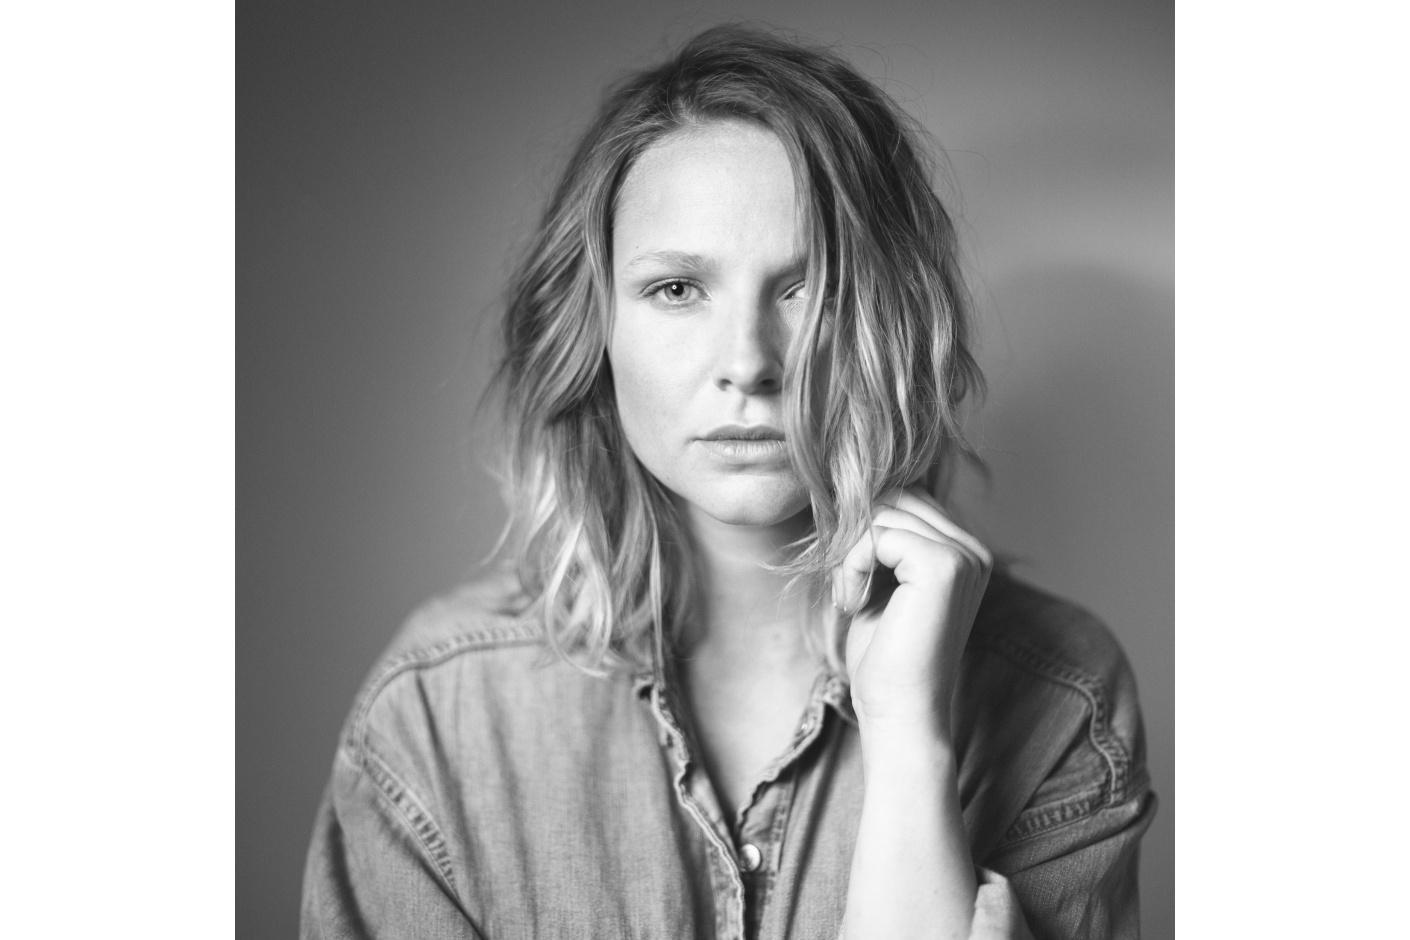 Jelle Pieter de Boer Hasselblad Photography LOTTE